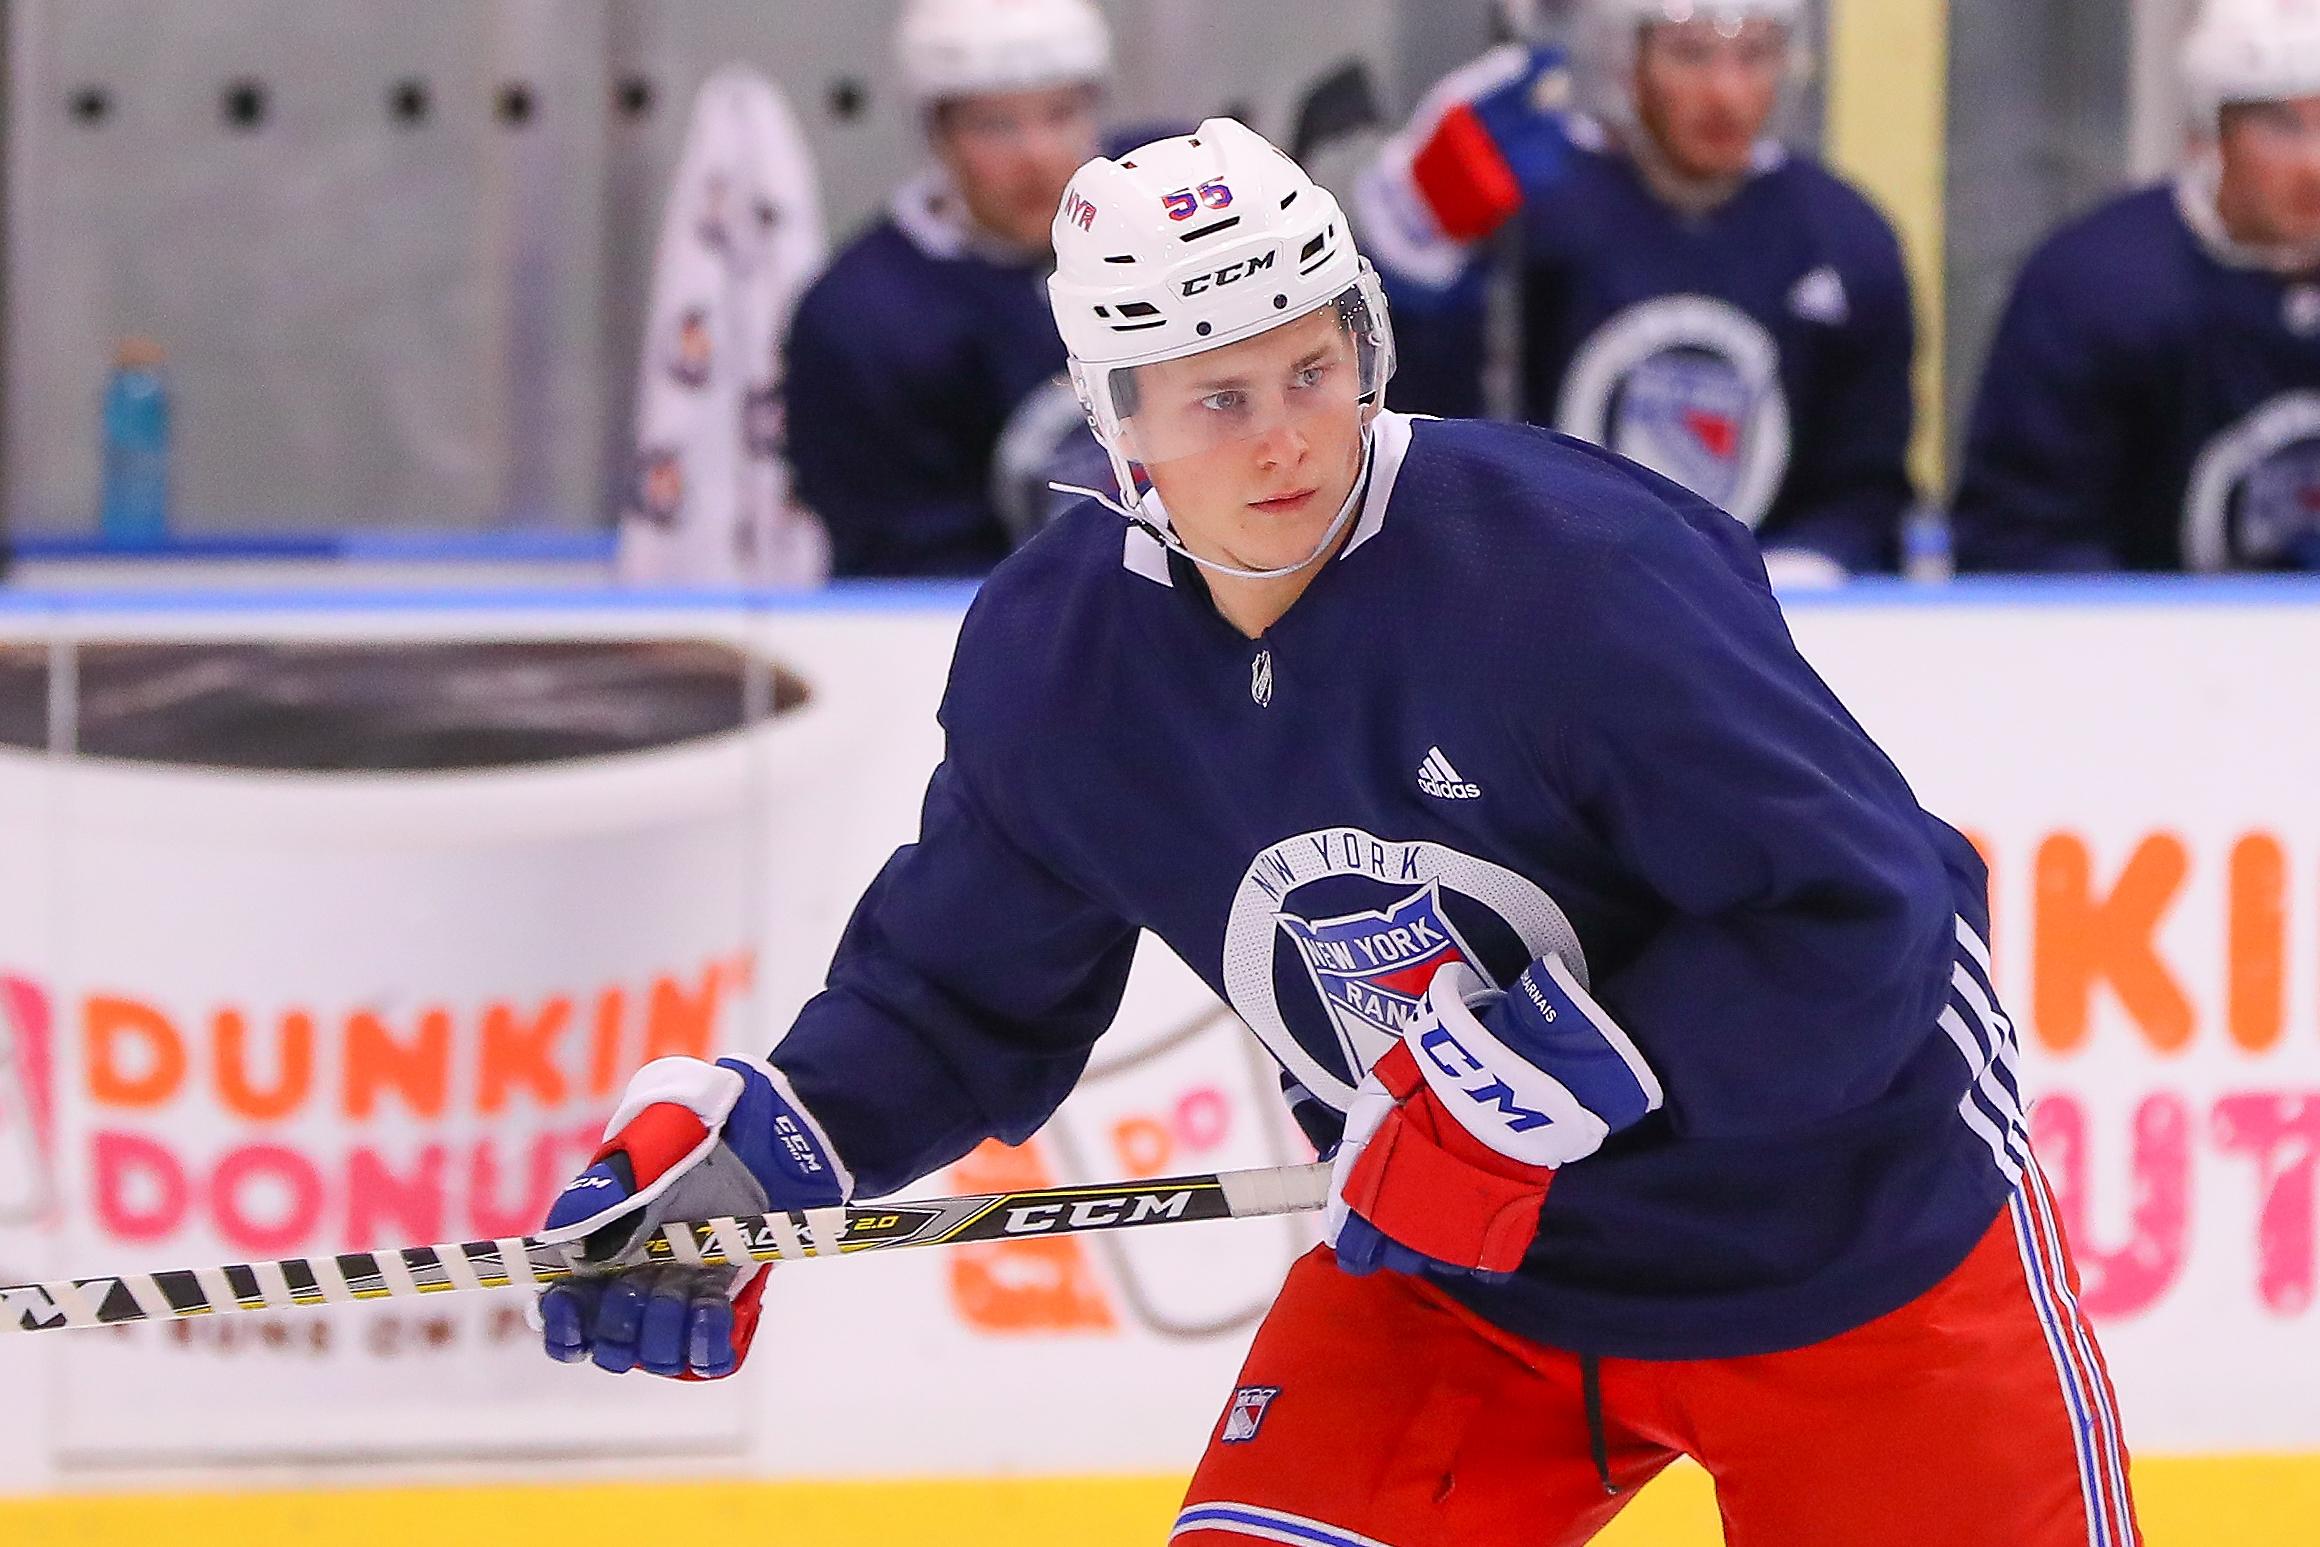 NHL: JUN 29 Rangers Prospect Development Camp